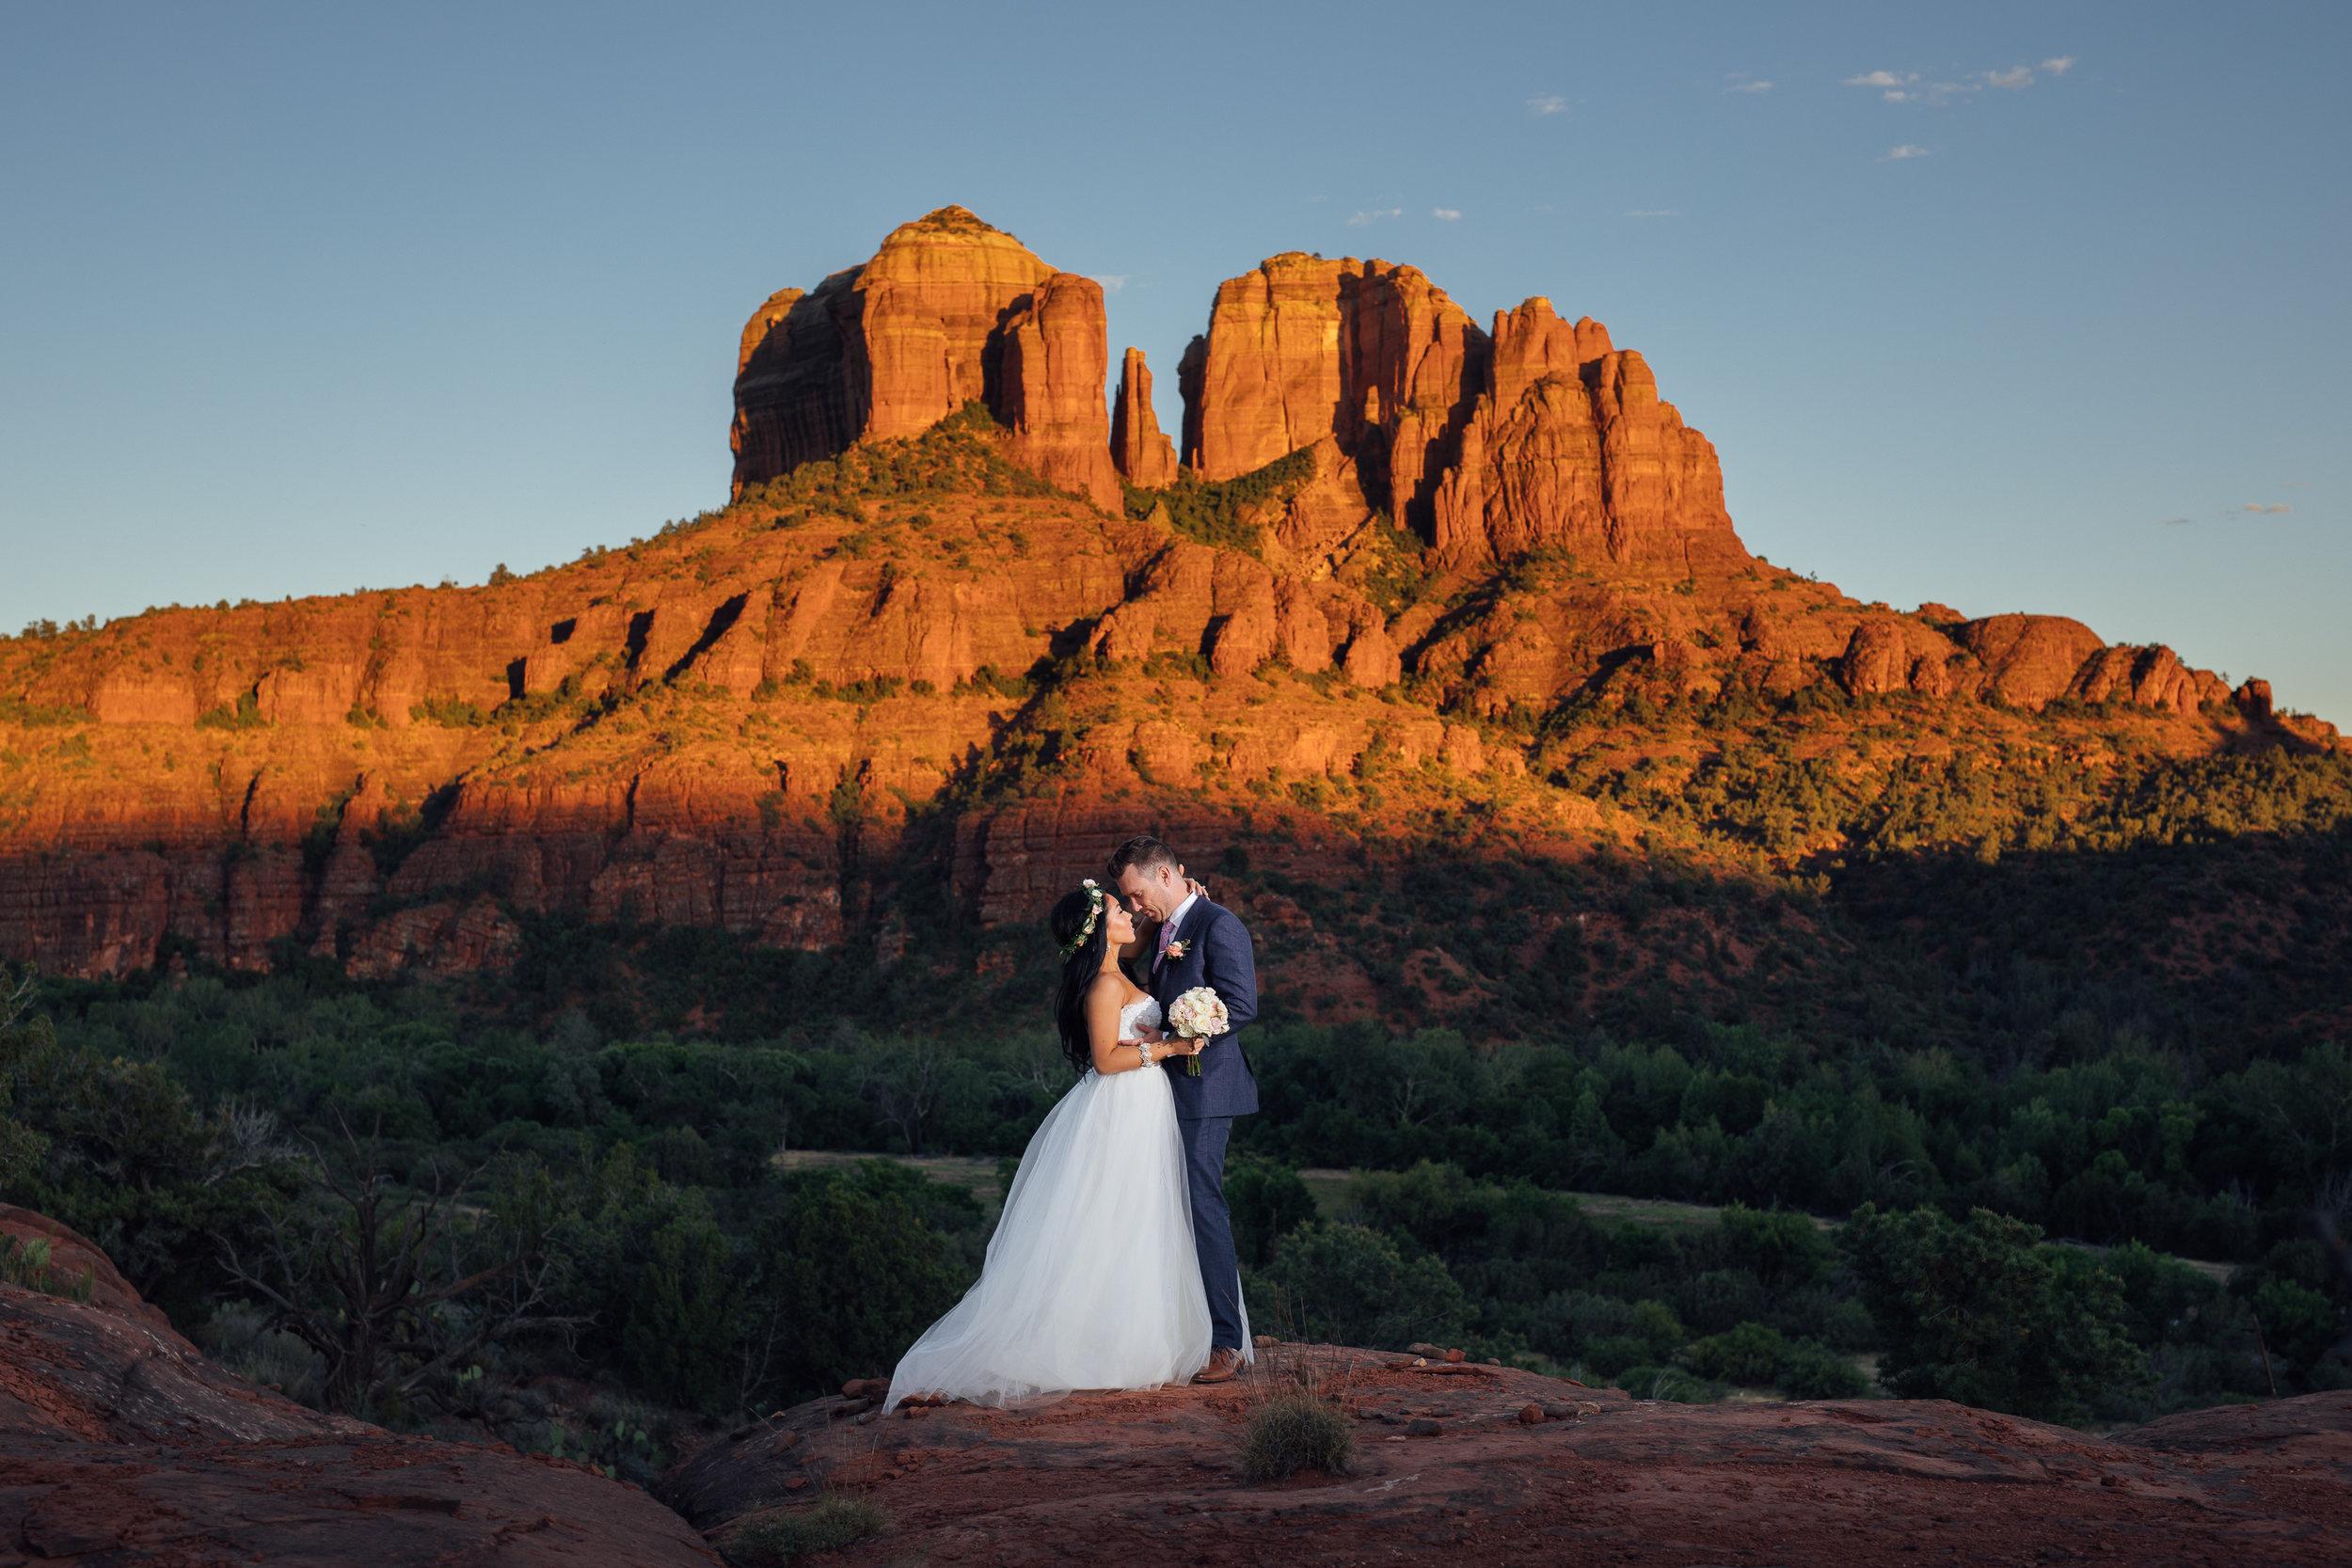 LMW-Sedona-lauberge-wedding-8095.jpg